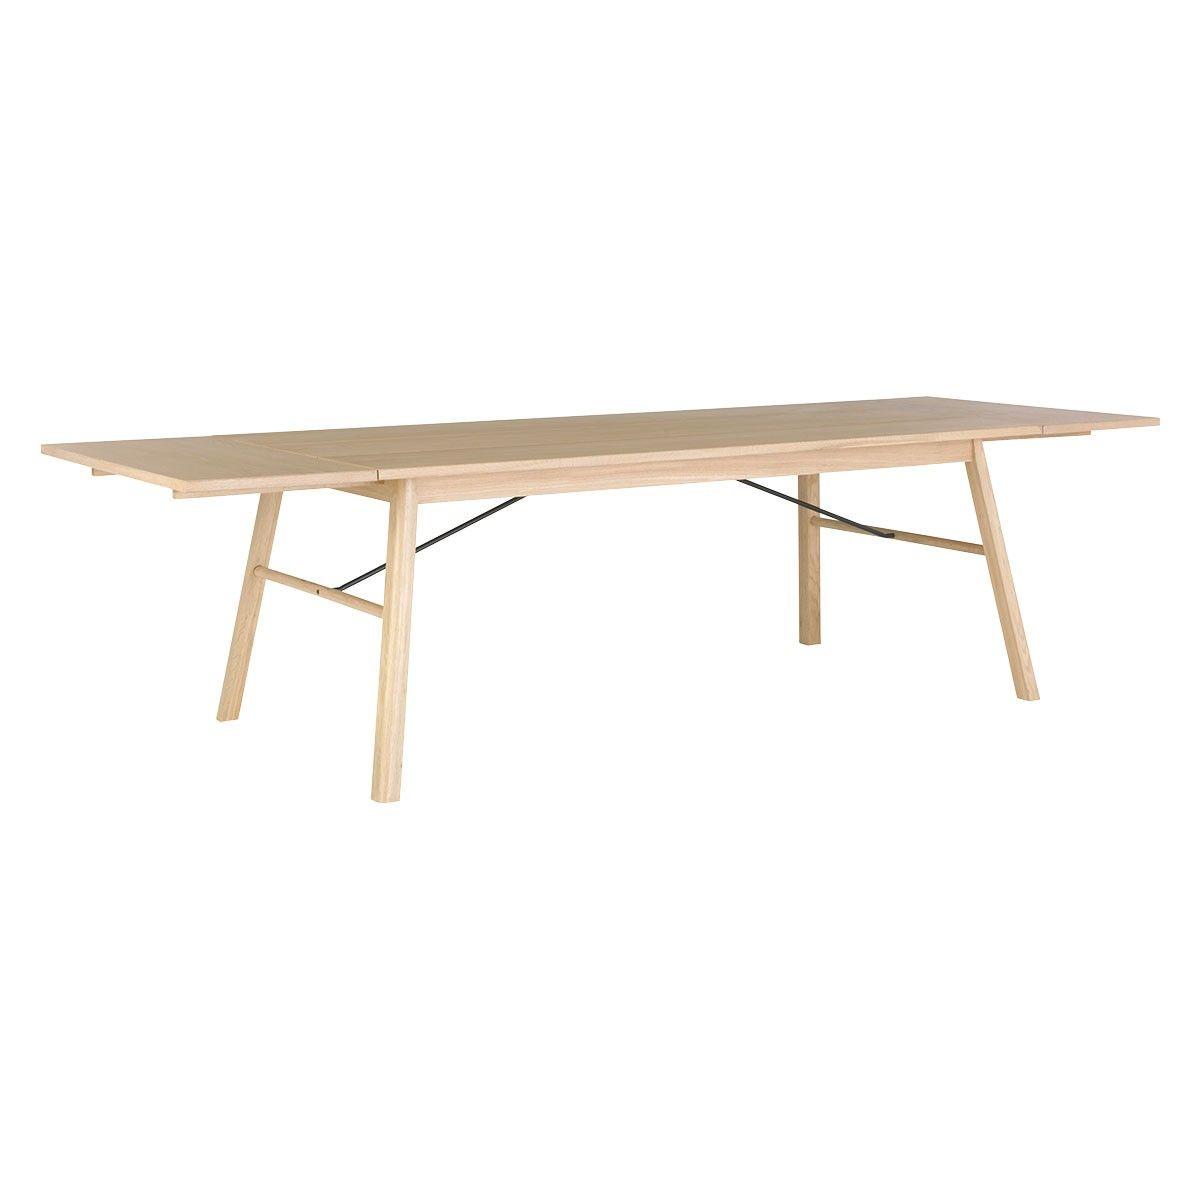 Atwood 8 12 Seat Oak Extending Dining Table Habitat 636